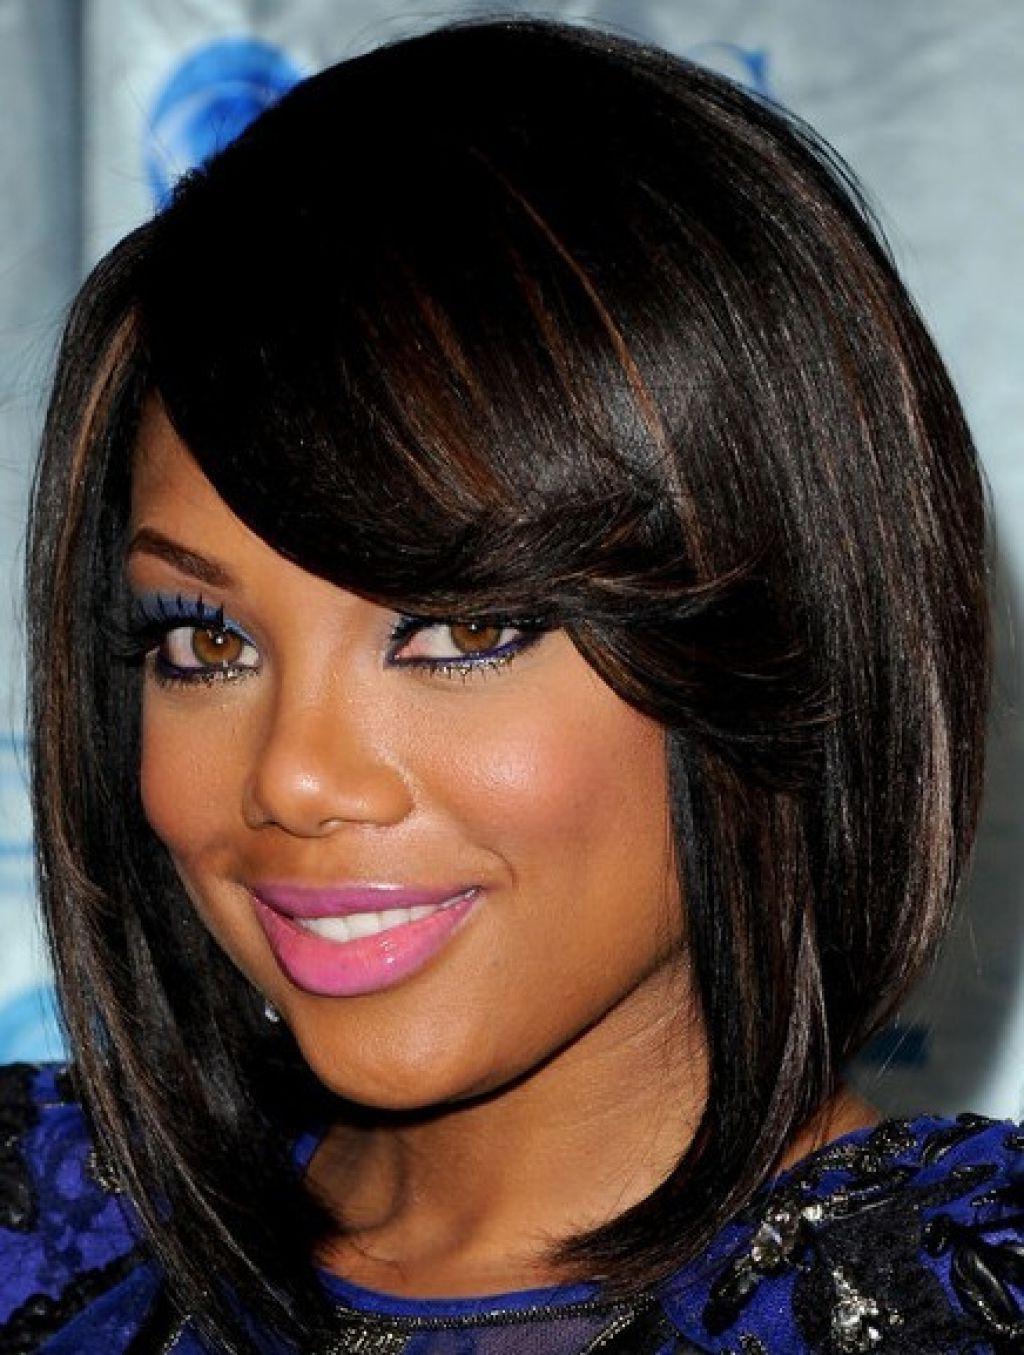 Trendy Medium Hairstyles For Black Ladies Within 27 Short Hairstyles And Haircuts For Black Women Of Class (View 7 of 20)